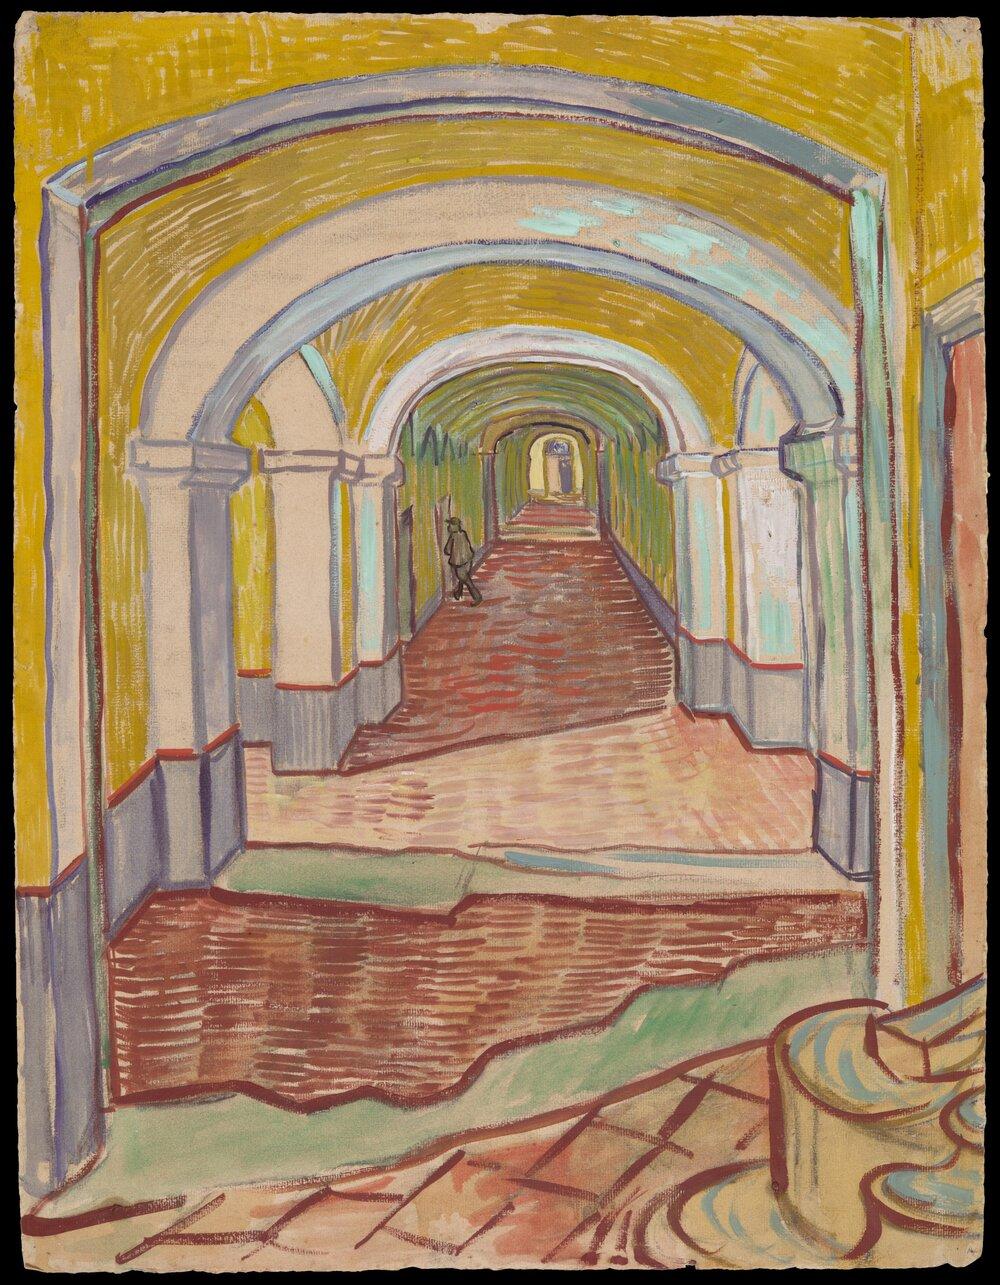 Вінсент ван Гог, Corridor in the Asylum, 1889